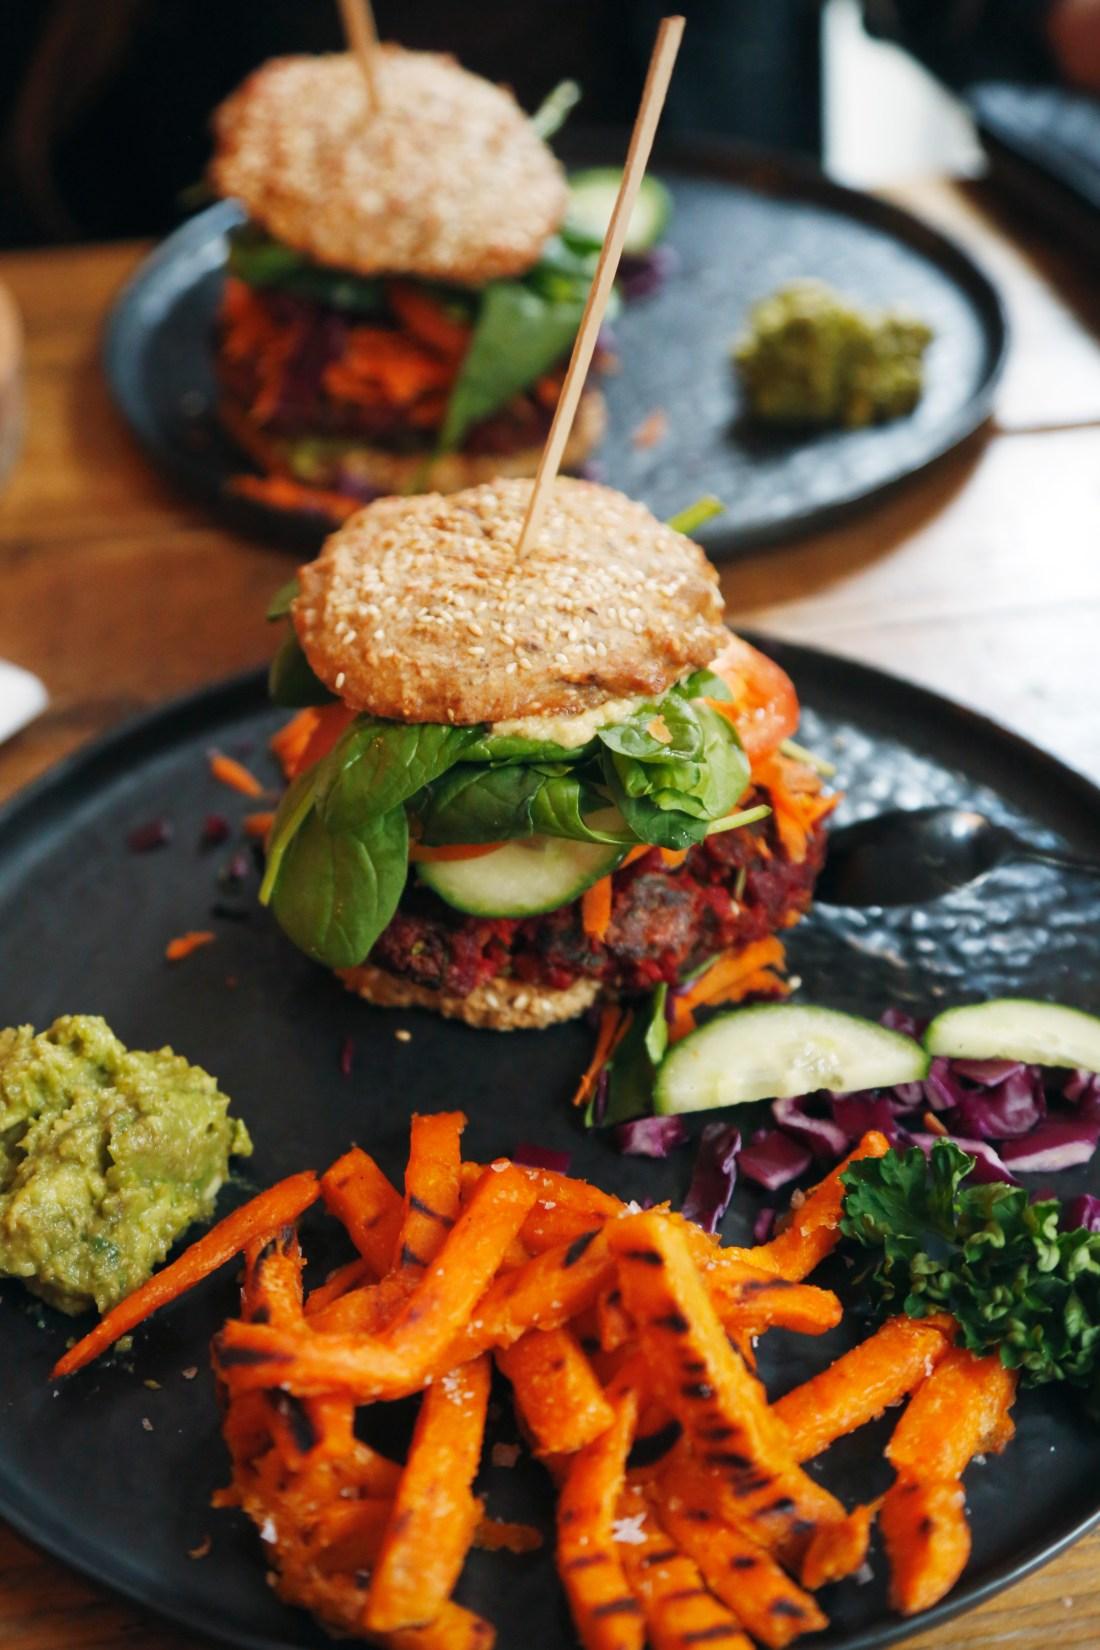 byens-bedste-burger-hope-bar-koebenhavn-1